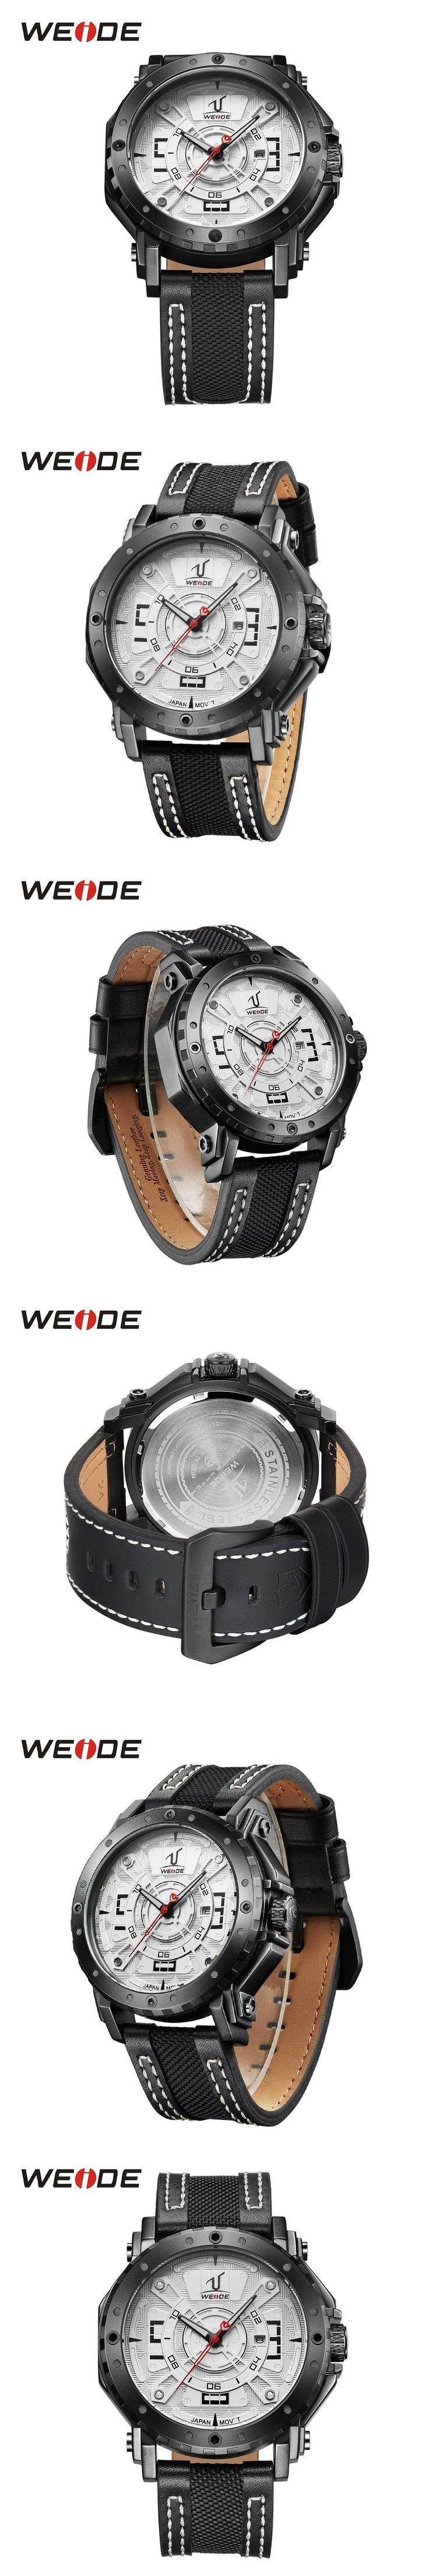 WEIDE Men Japan Quartz Movement Watch Analog Date Calendar Display Hardlex Black Leather Strap Band Waterproof Wristwatch Sport